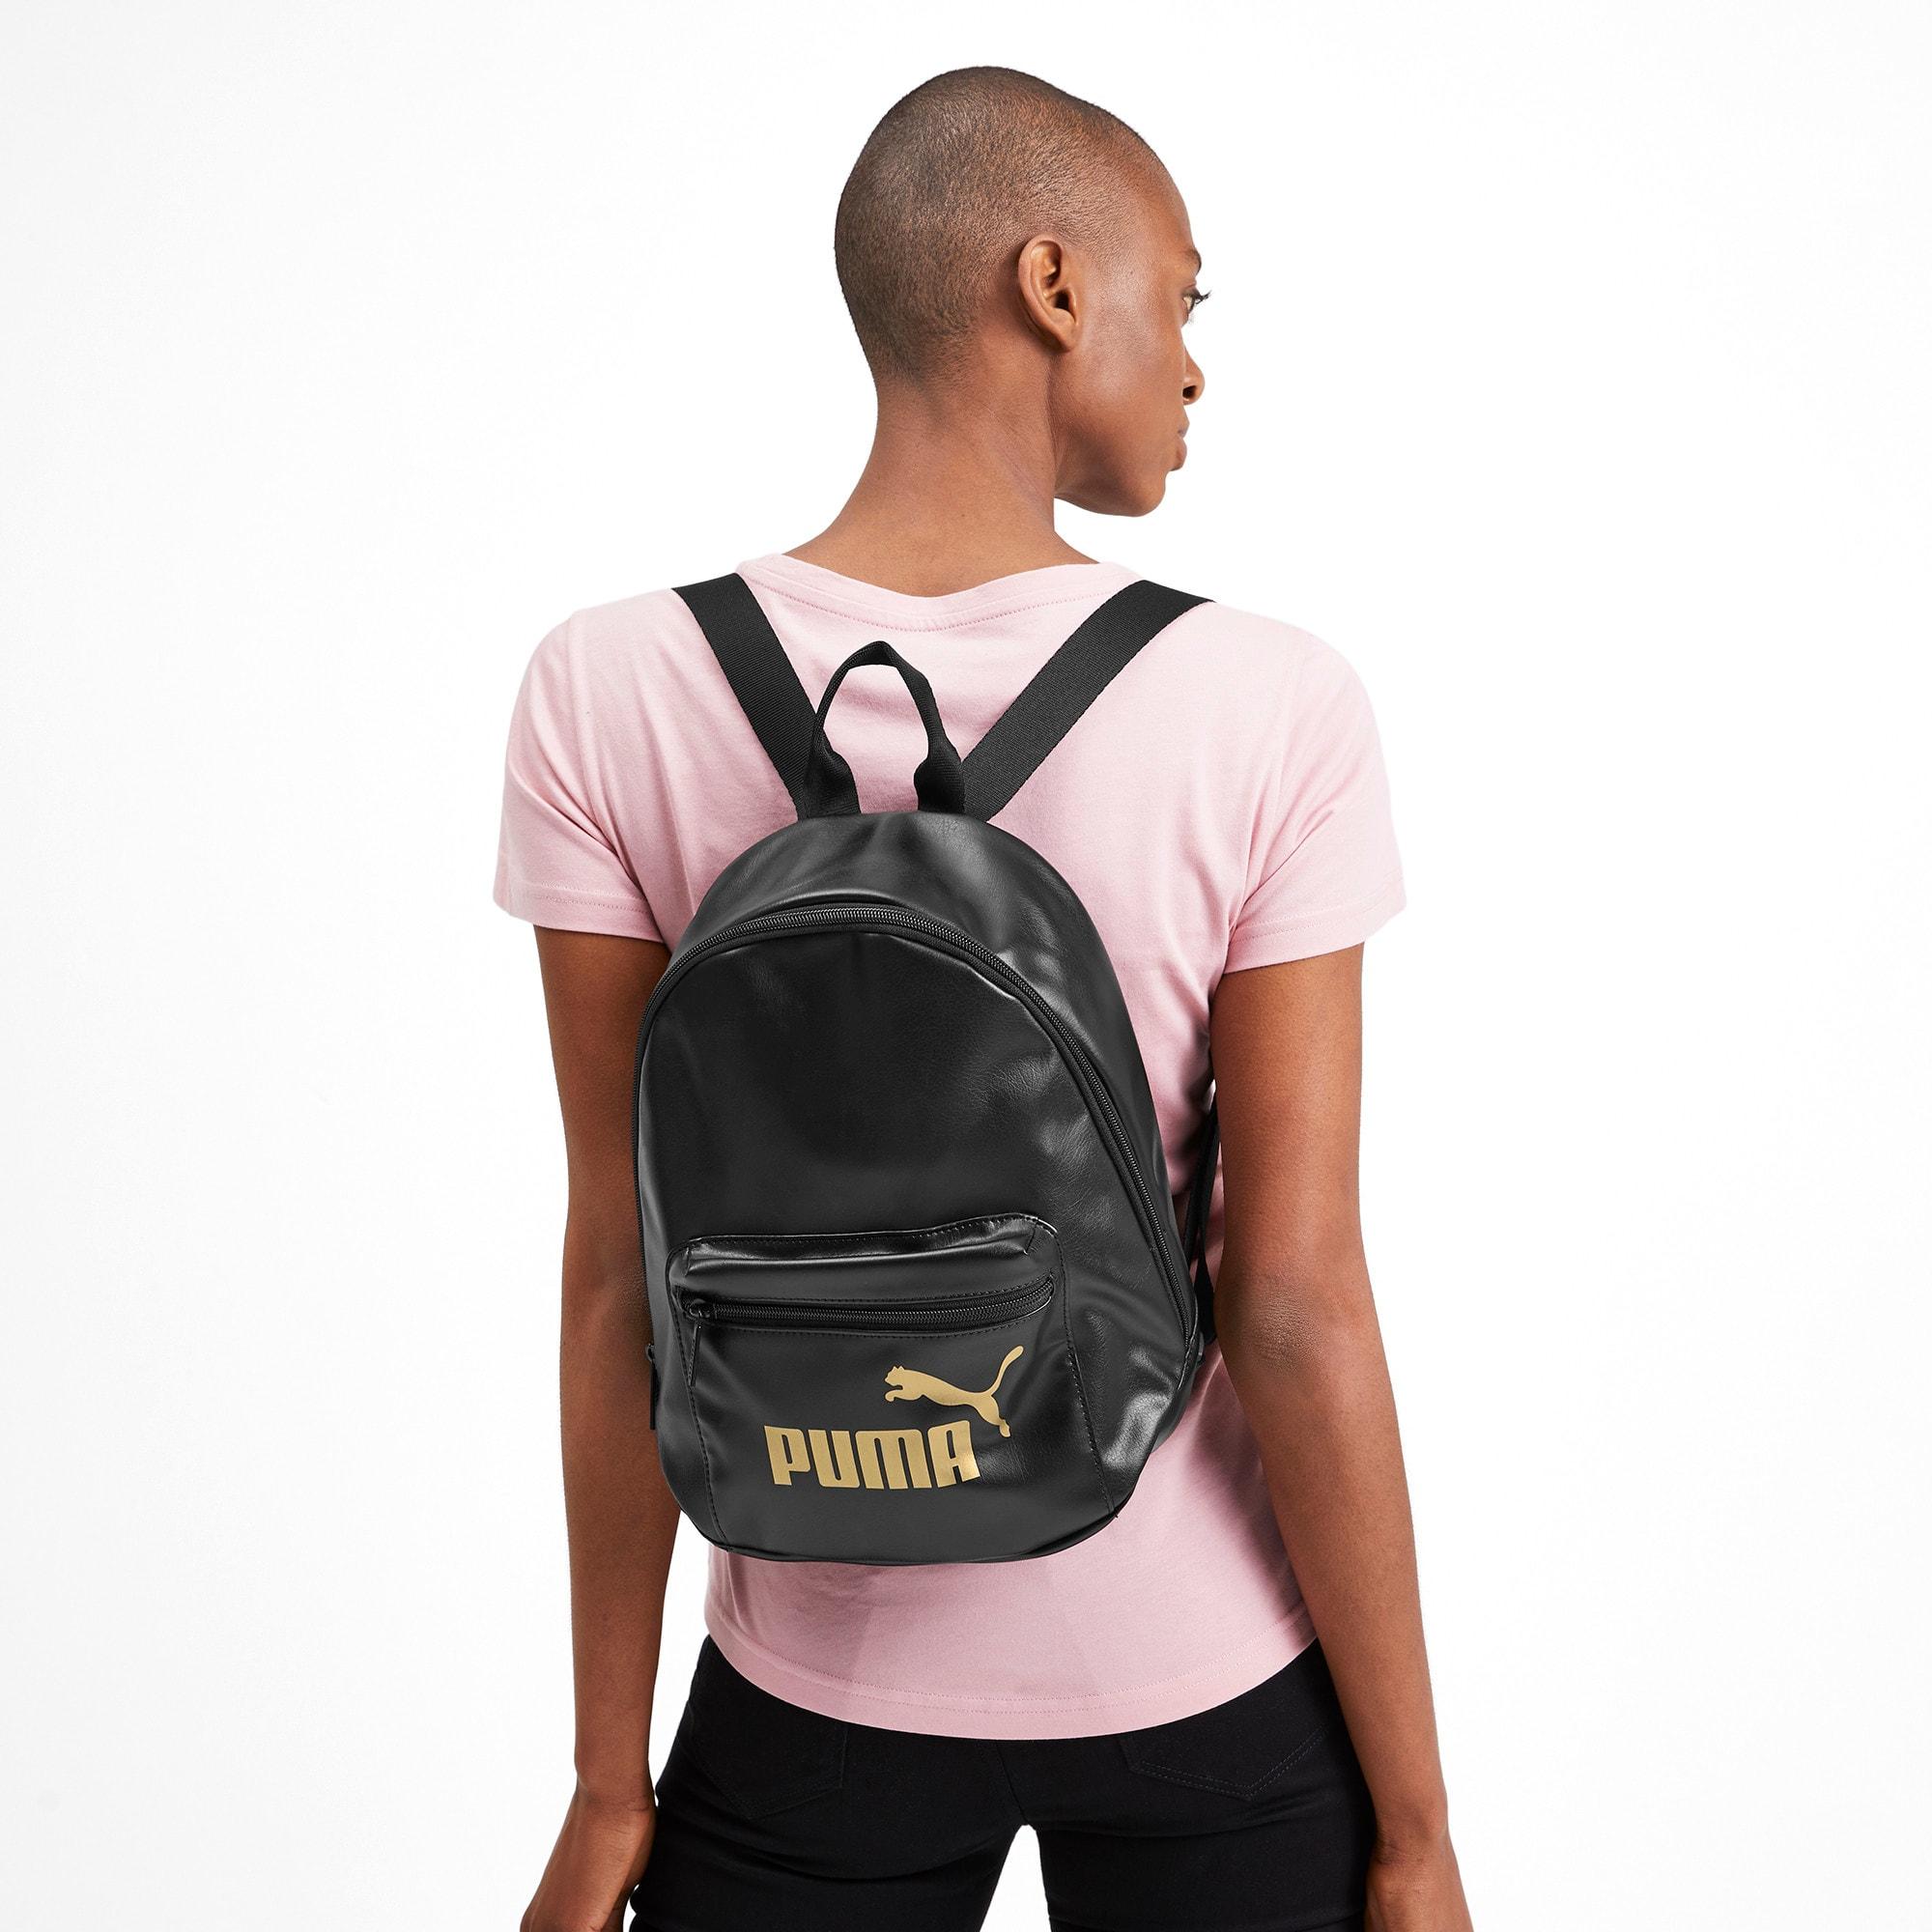 Thumbnail 2 of Up Women's Archive Backpack, Puma Black-Gold, medium